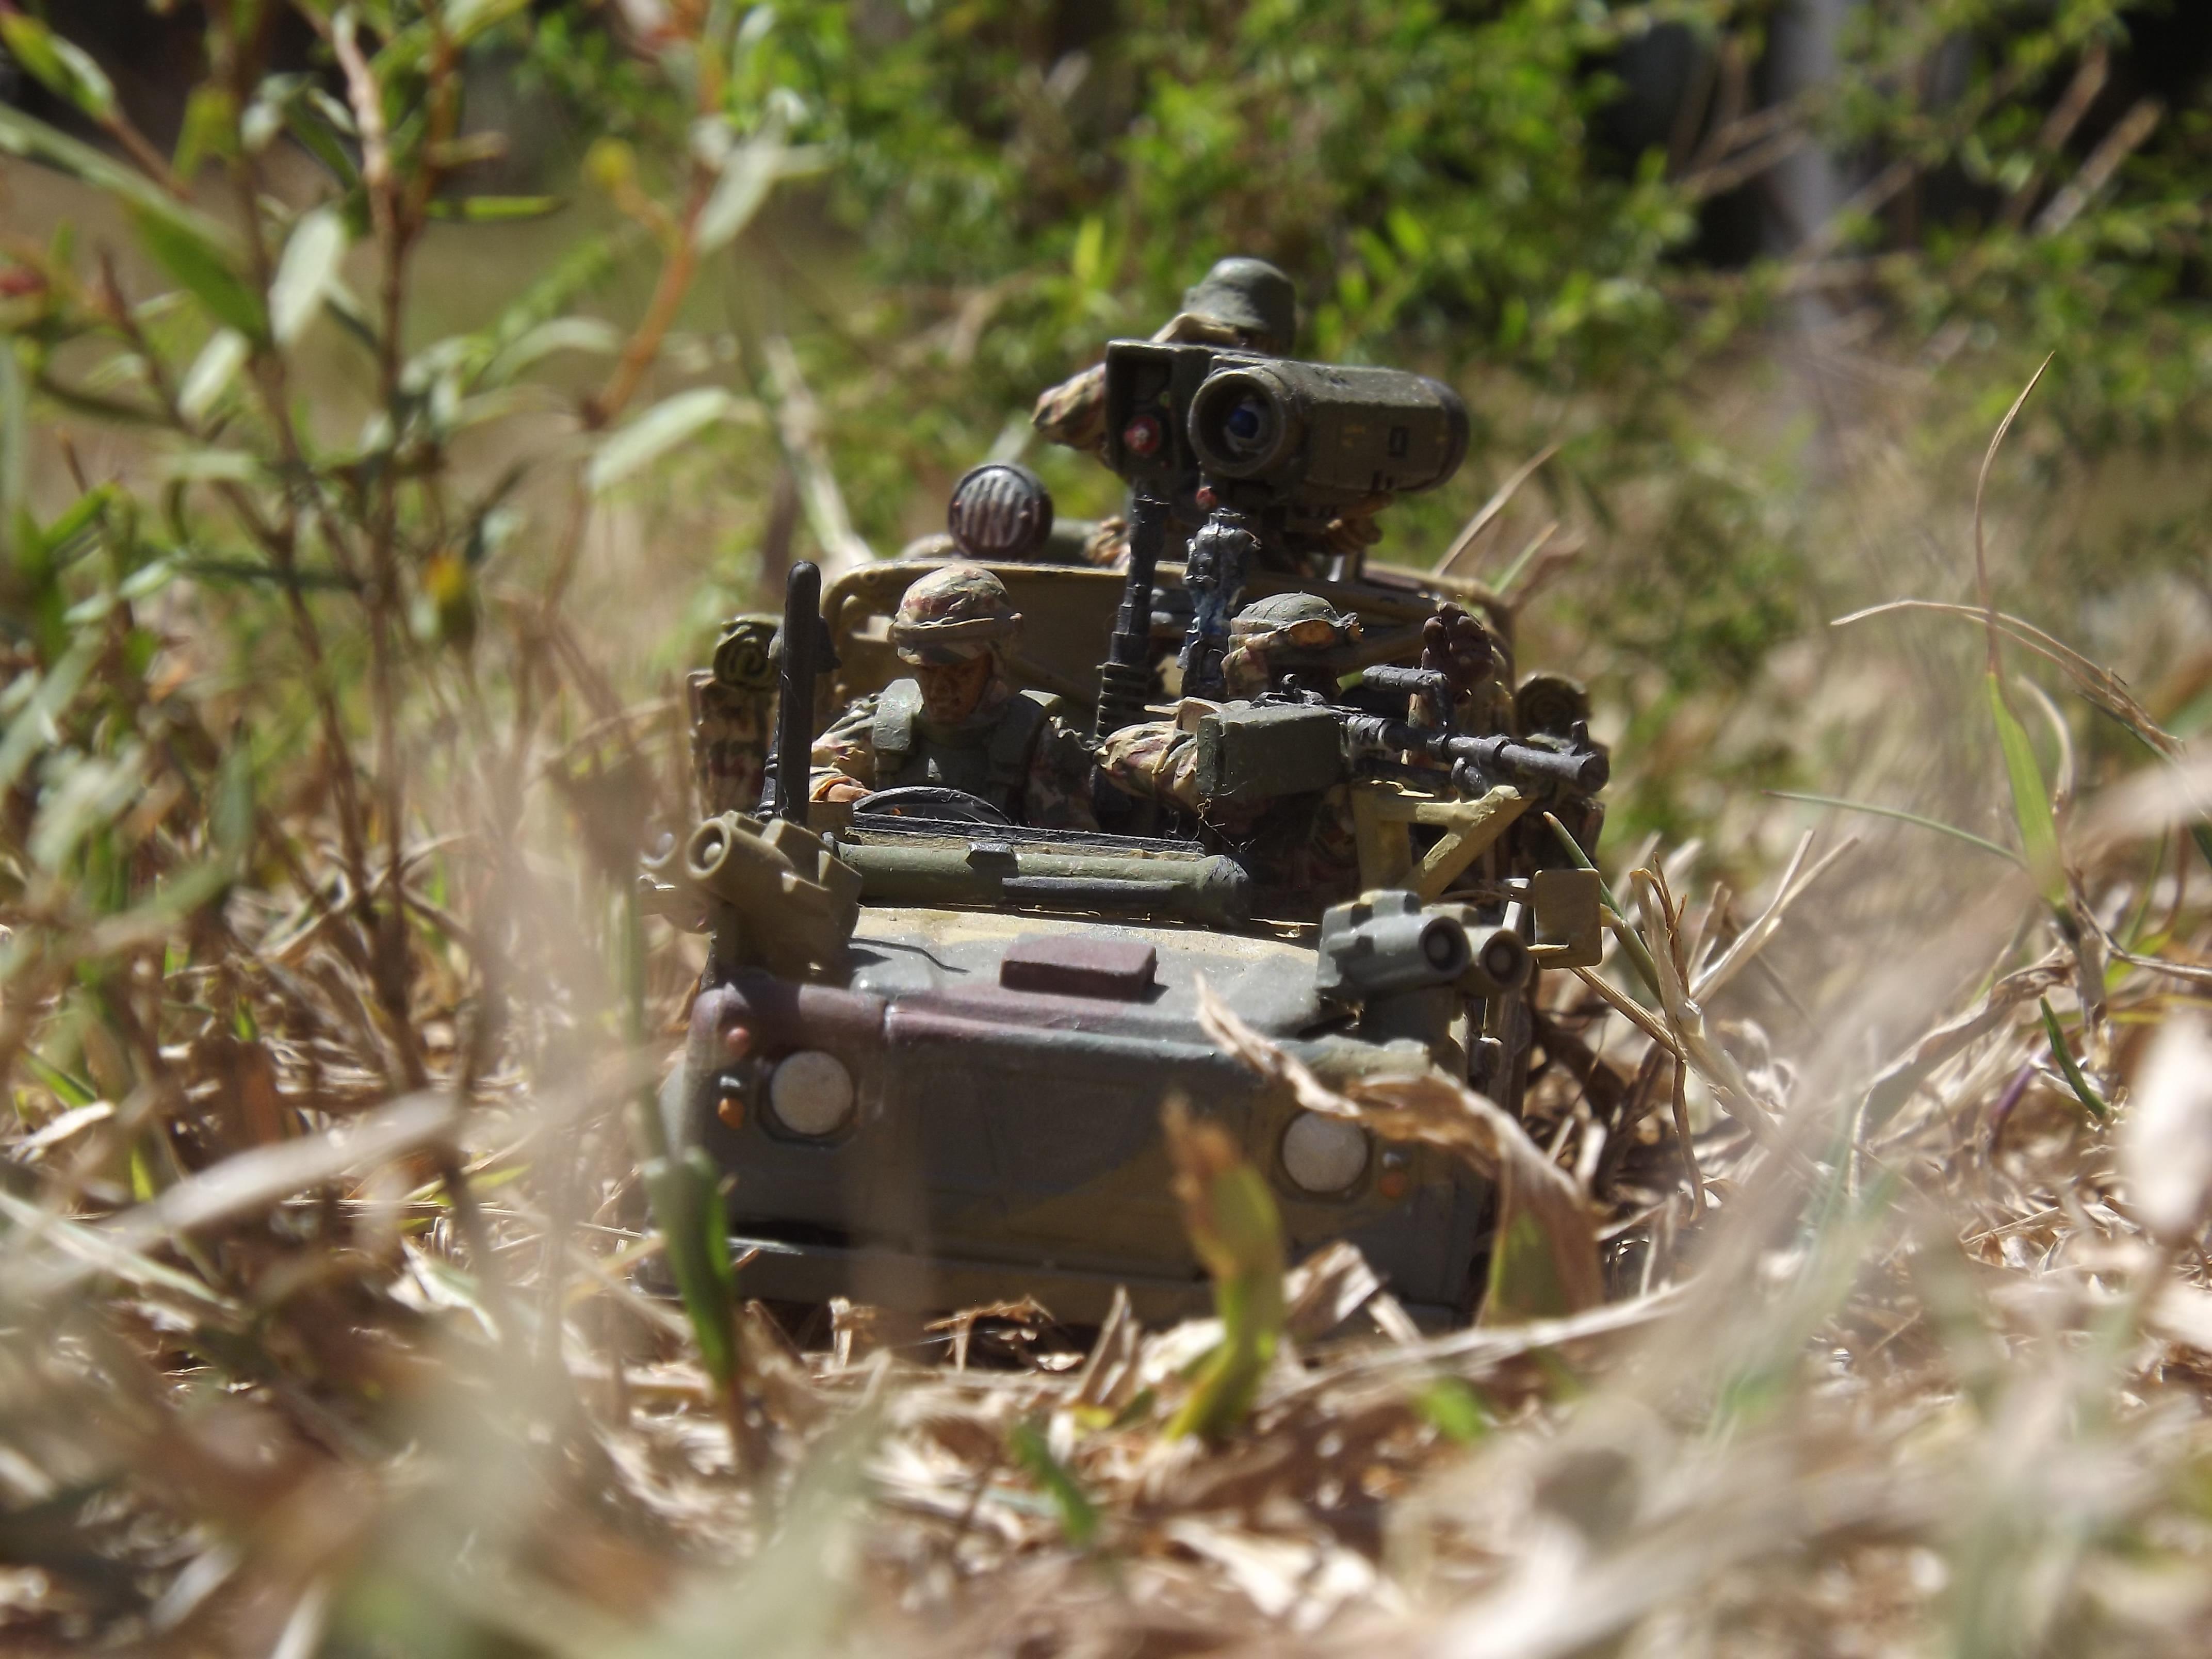 Arcadians, Cars, Defender, Gpmg, Guardsmen, Imperial Guard, Landrover, Missile Launcher, Recon, Victoria Miniatures, Wmik